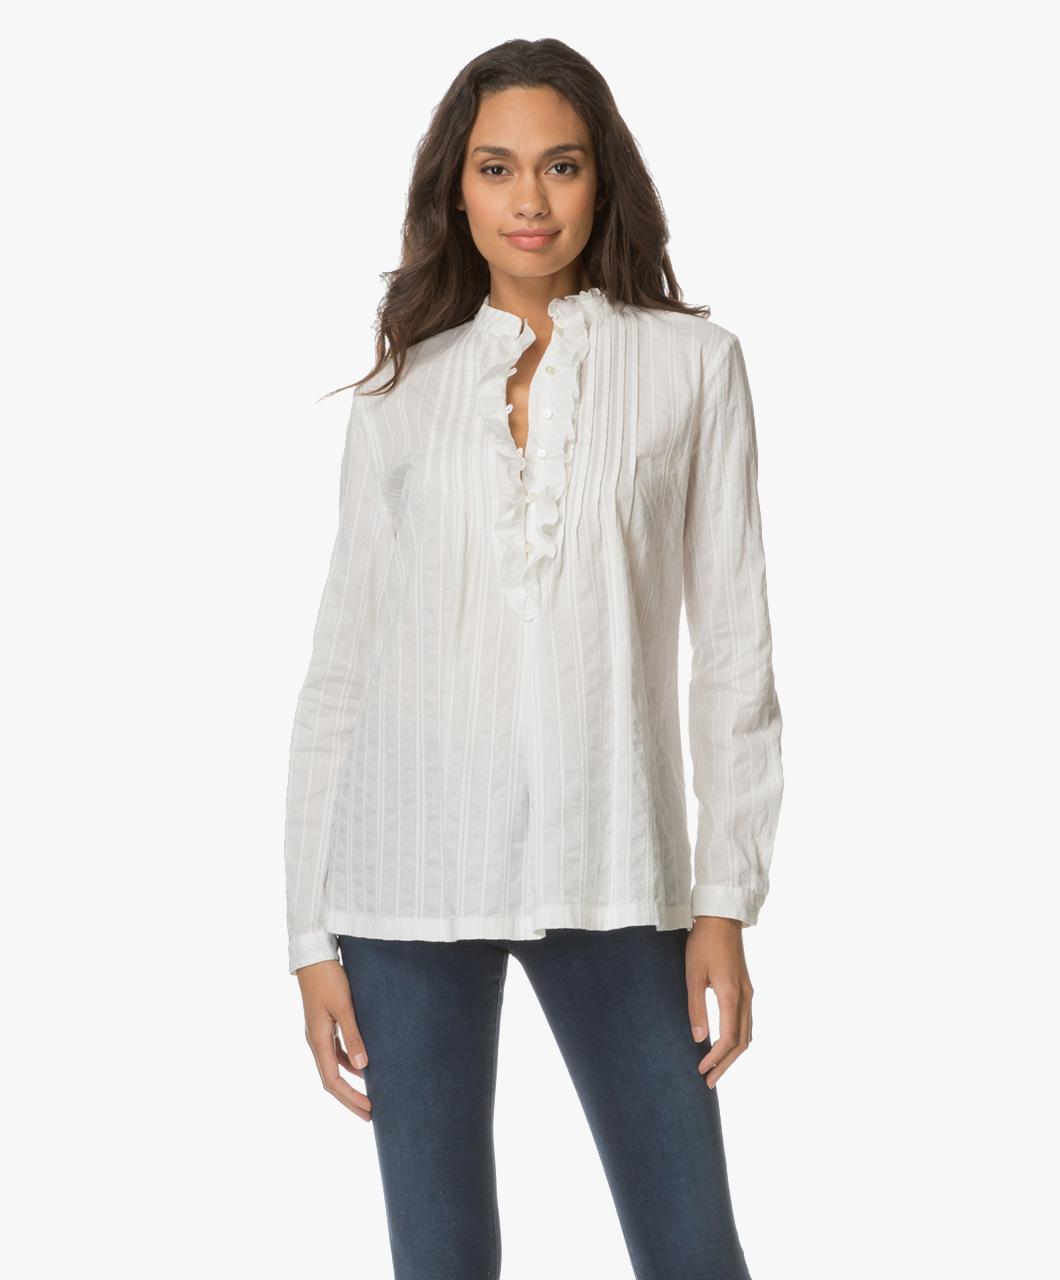 boss orange cubana crisp pleats blouse white cubana 50377979 115 open. Black Bedroom Furniture Sets. Home Design Ideas